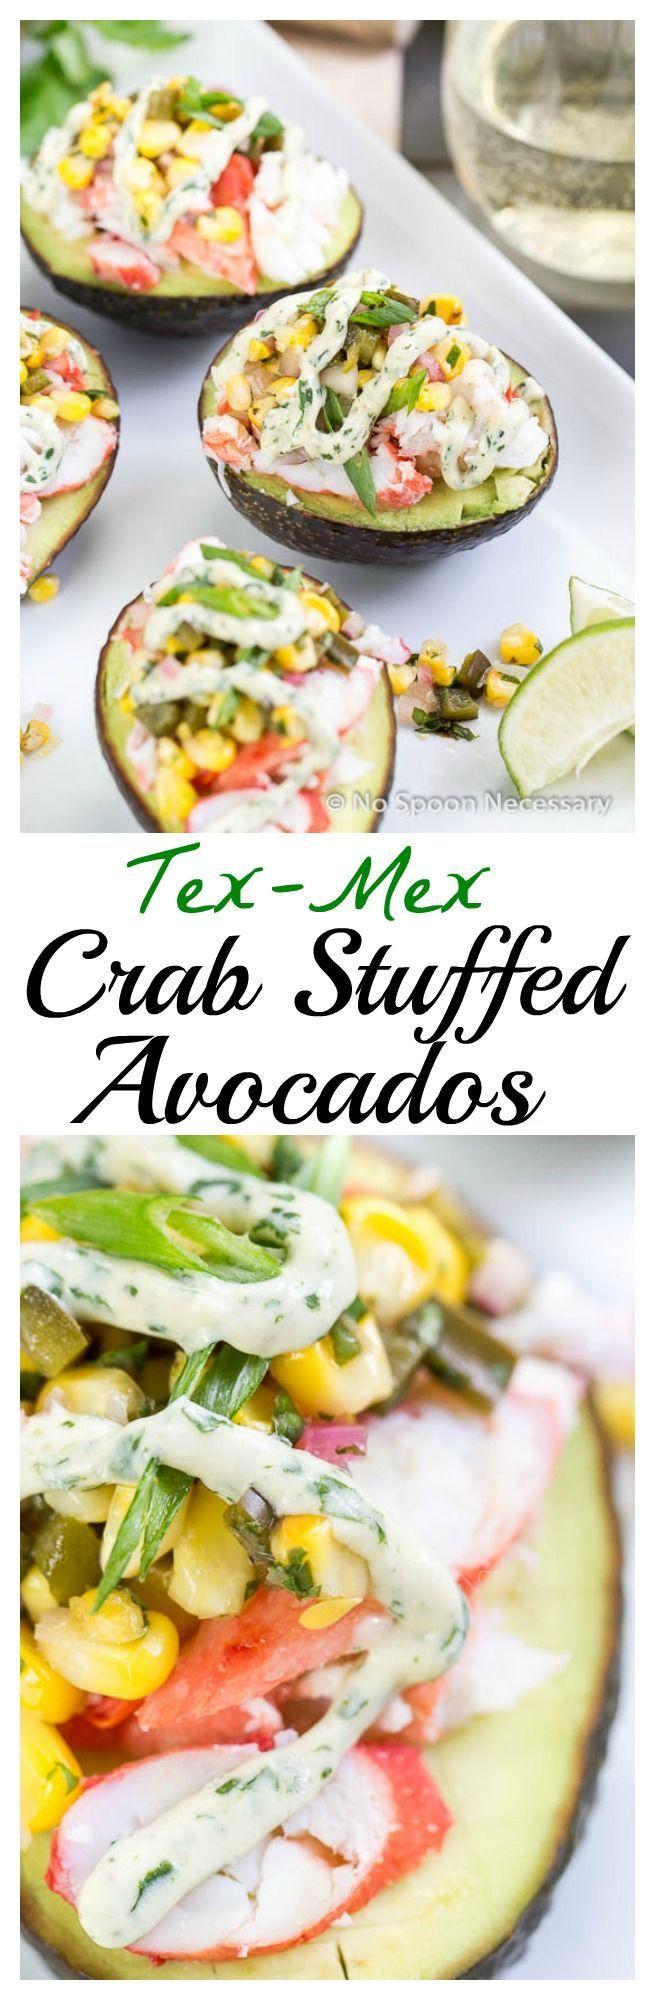 Tex Mex King Crab & Corn Stuffed Avocados with Lime-Cilantro-Sriracha Crema